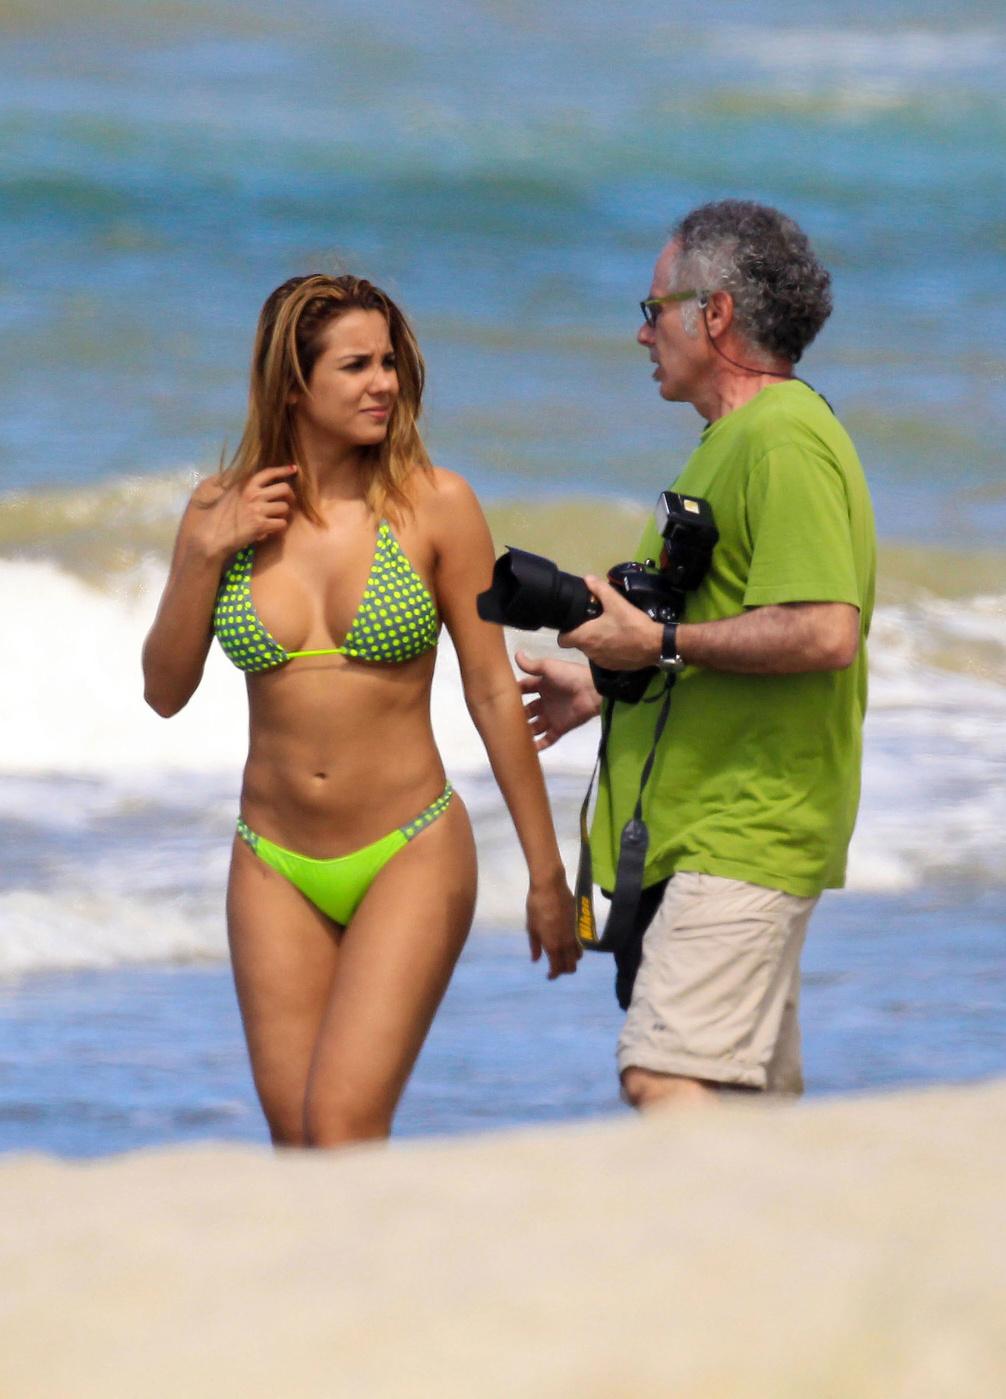 Pics Viviana Figueredo nudes (95 foto and video), Sexy, Paparazzi, Boobs, butt 2019